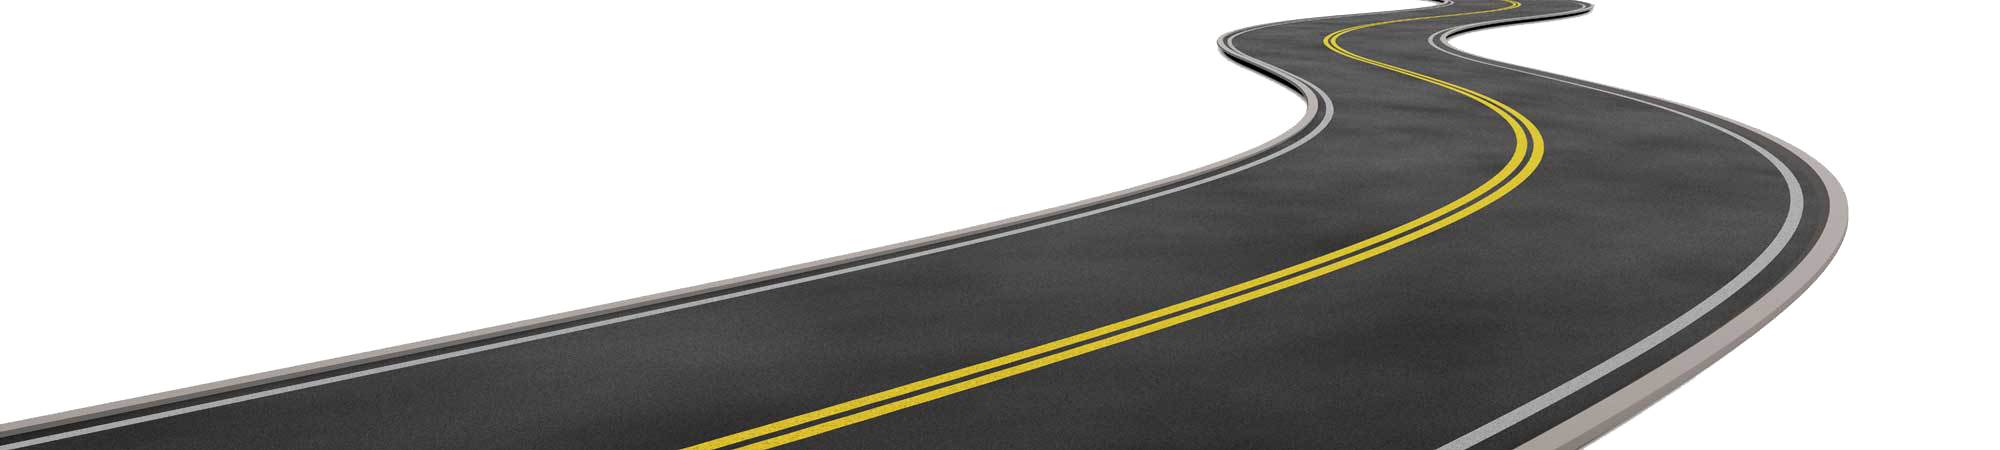 Trail clipart curve road. Png images transparent free